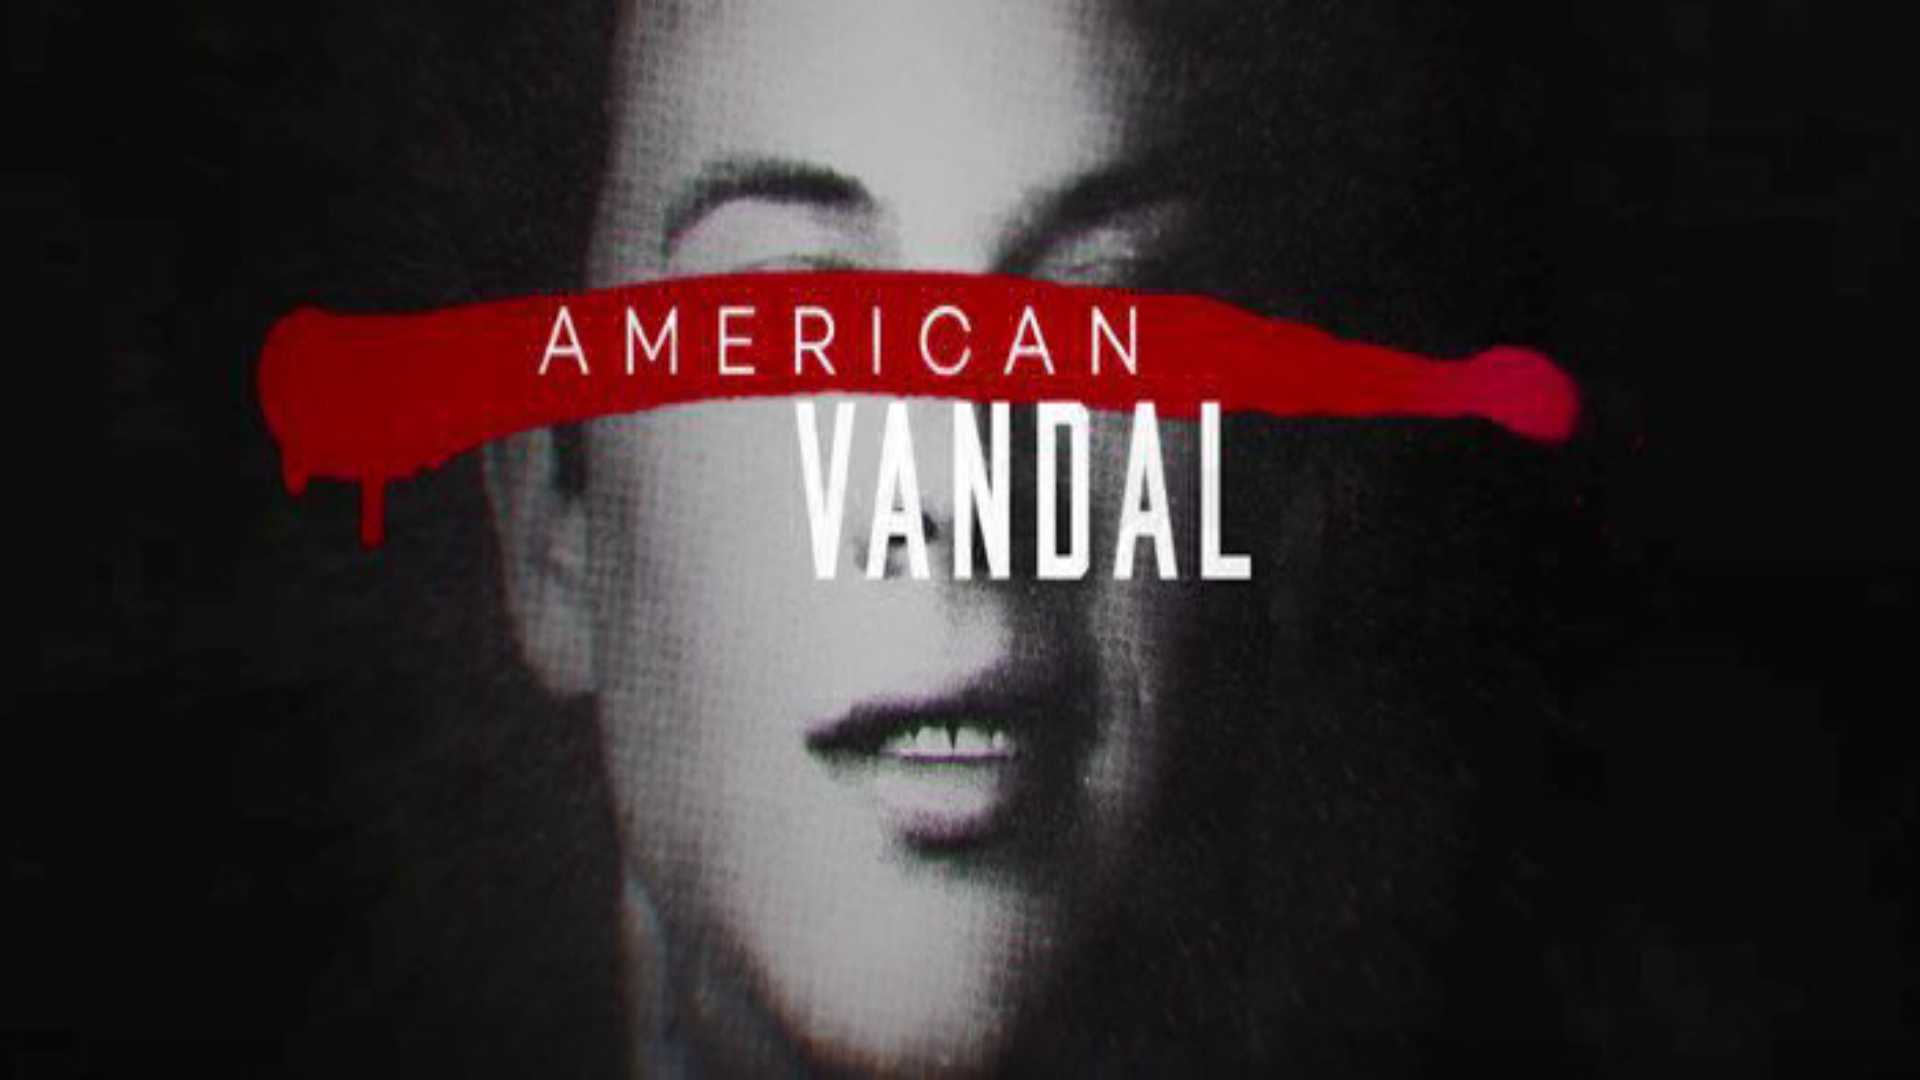 AMERICAN VANDAL Season 2 Netflixs Satirical Series Hits Back In 1920x1080